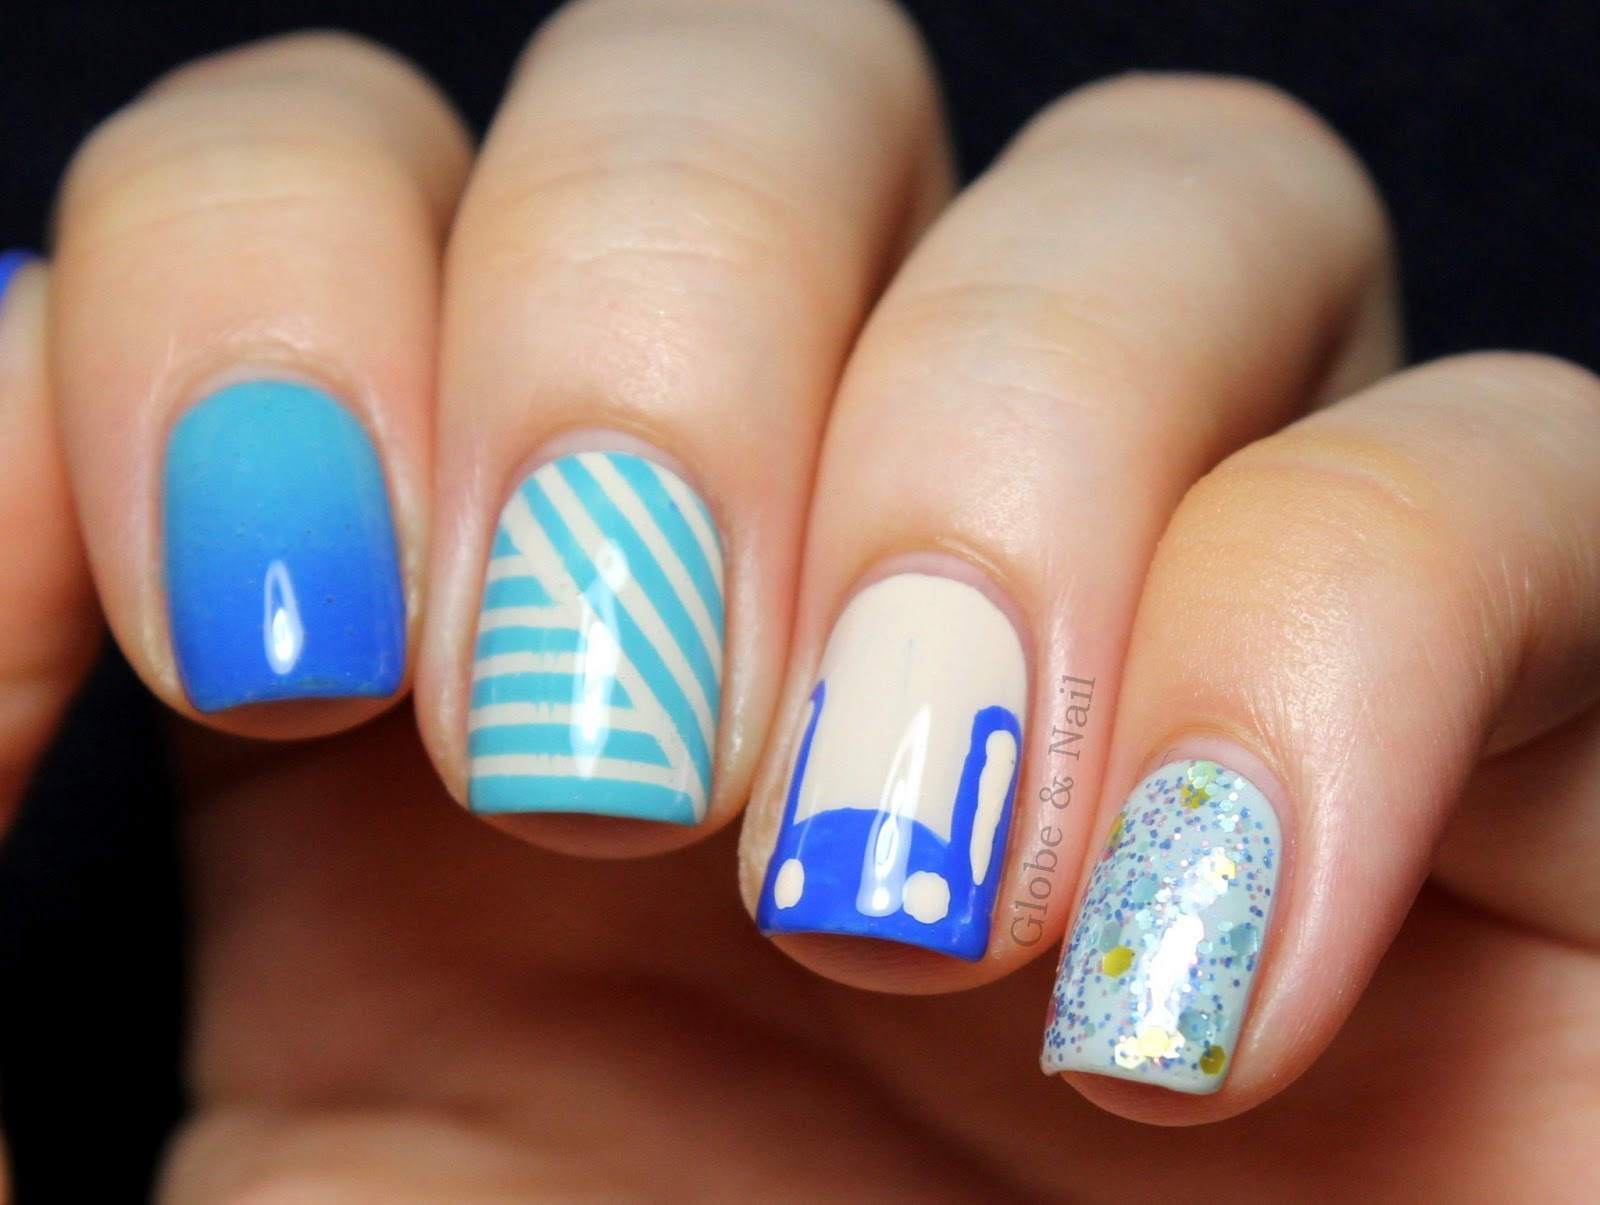 Globe nail le bunny bleu skittle nail art - Nail art bleu ...